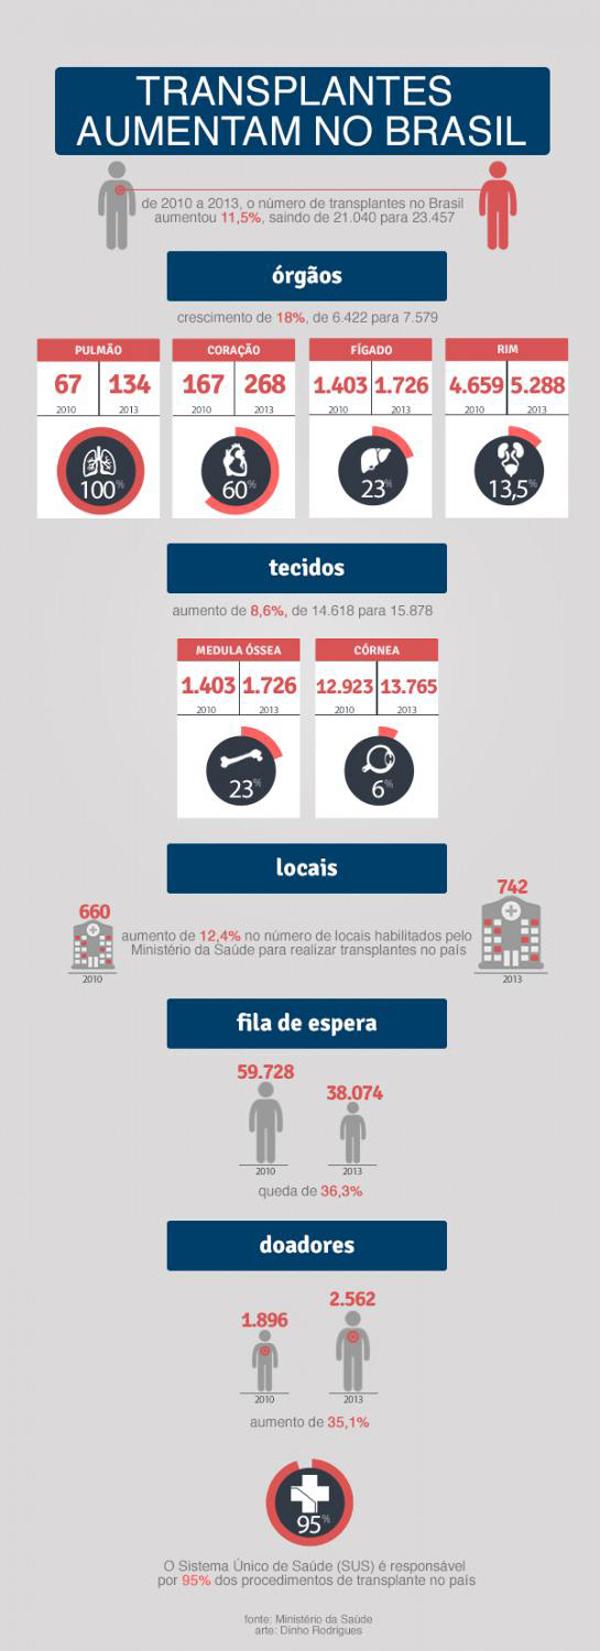 transplantes_no_brasil